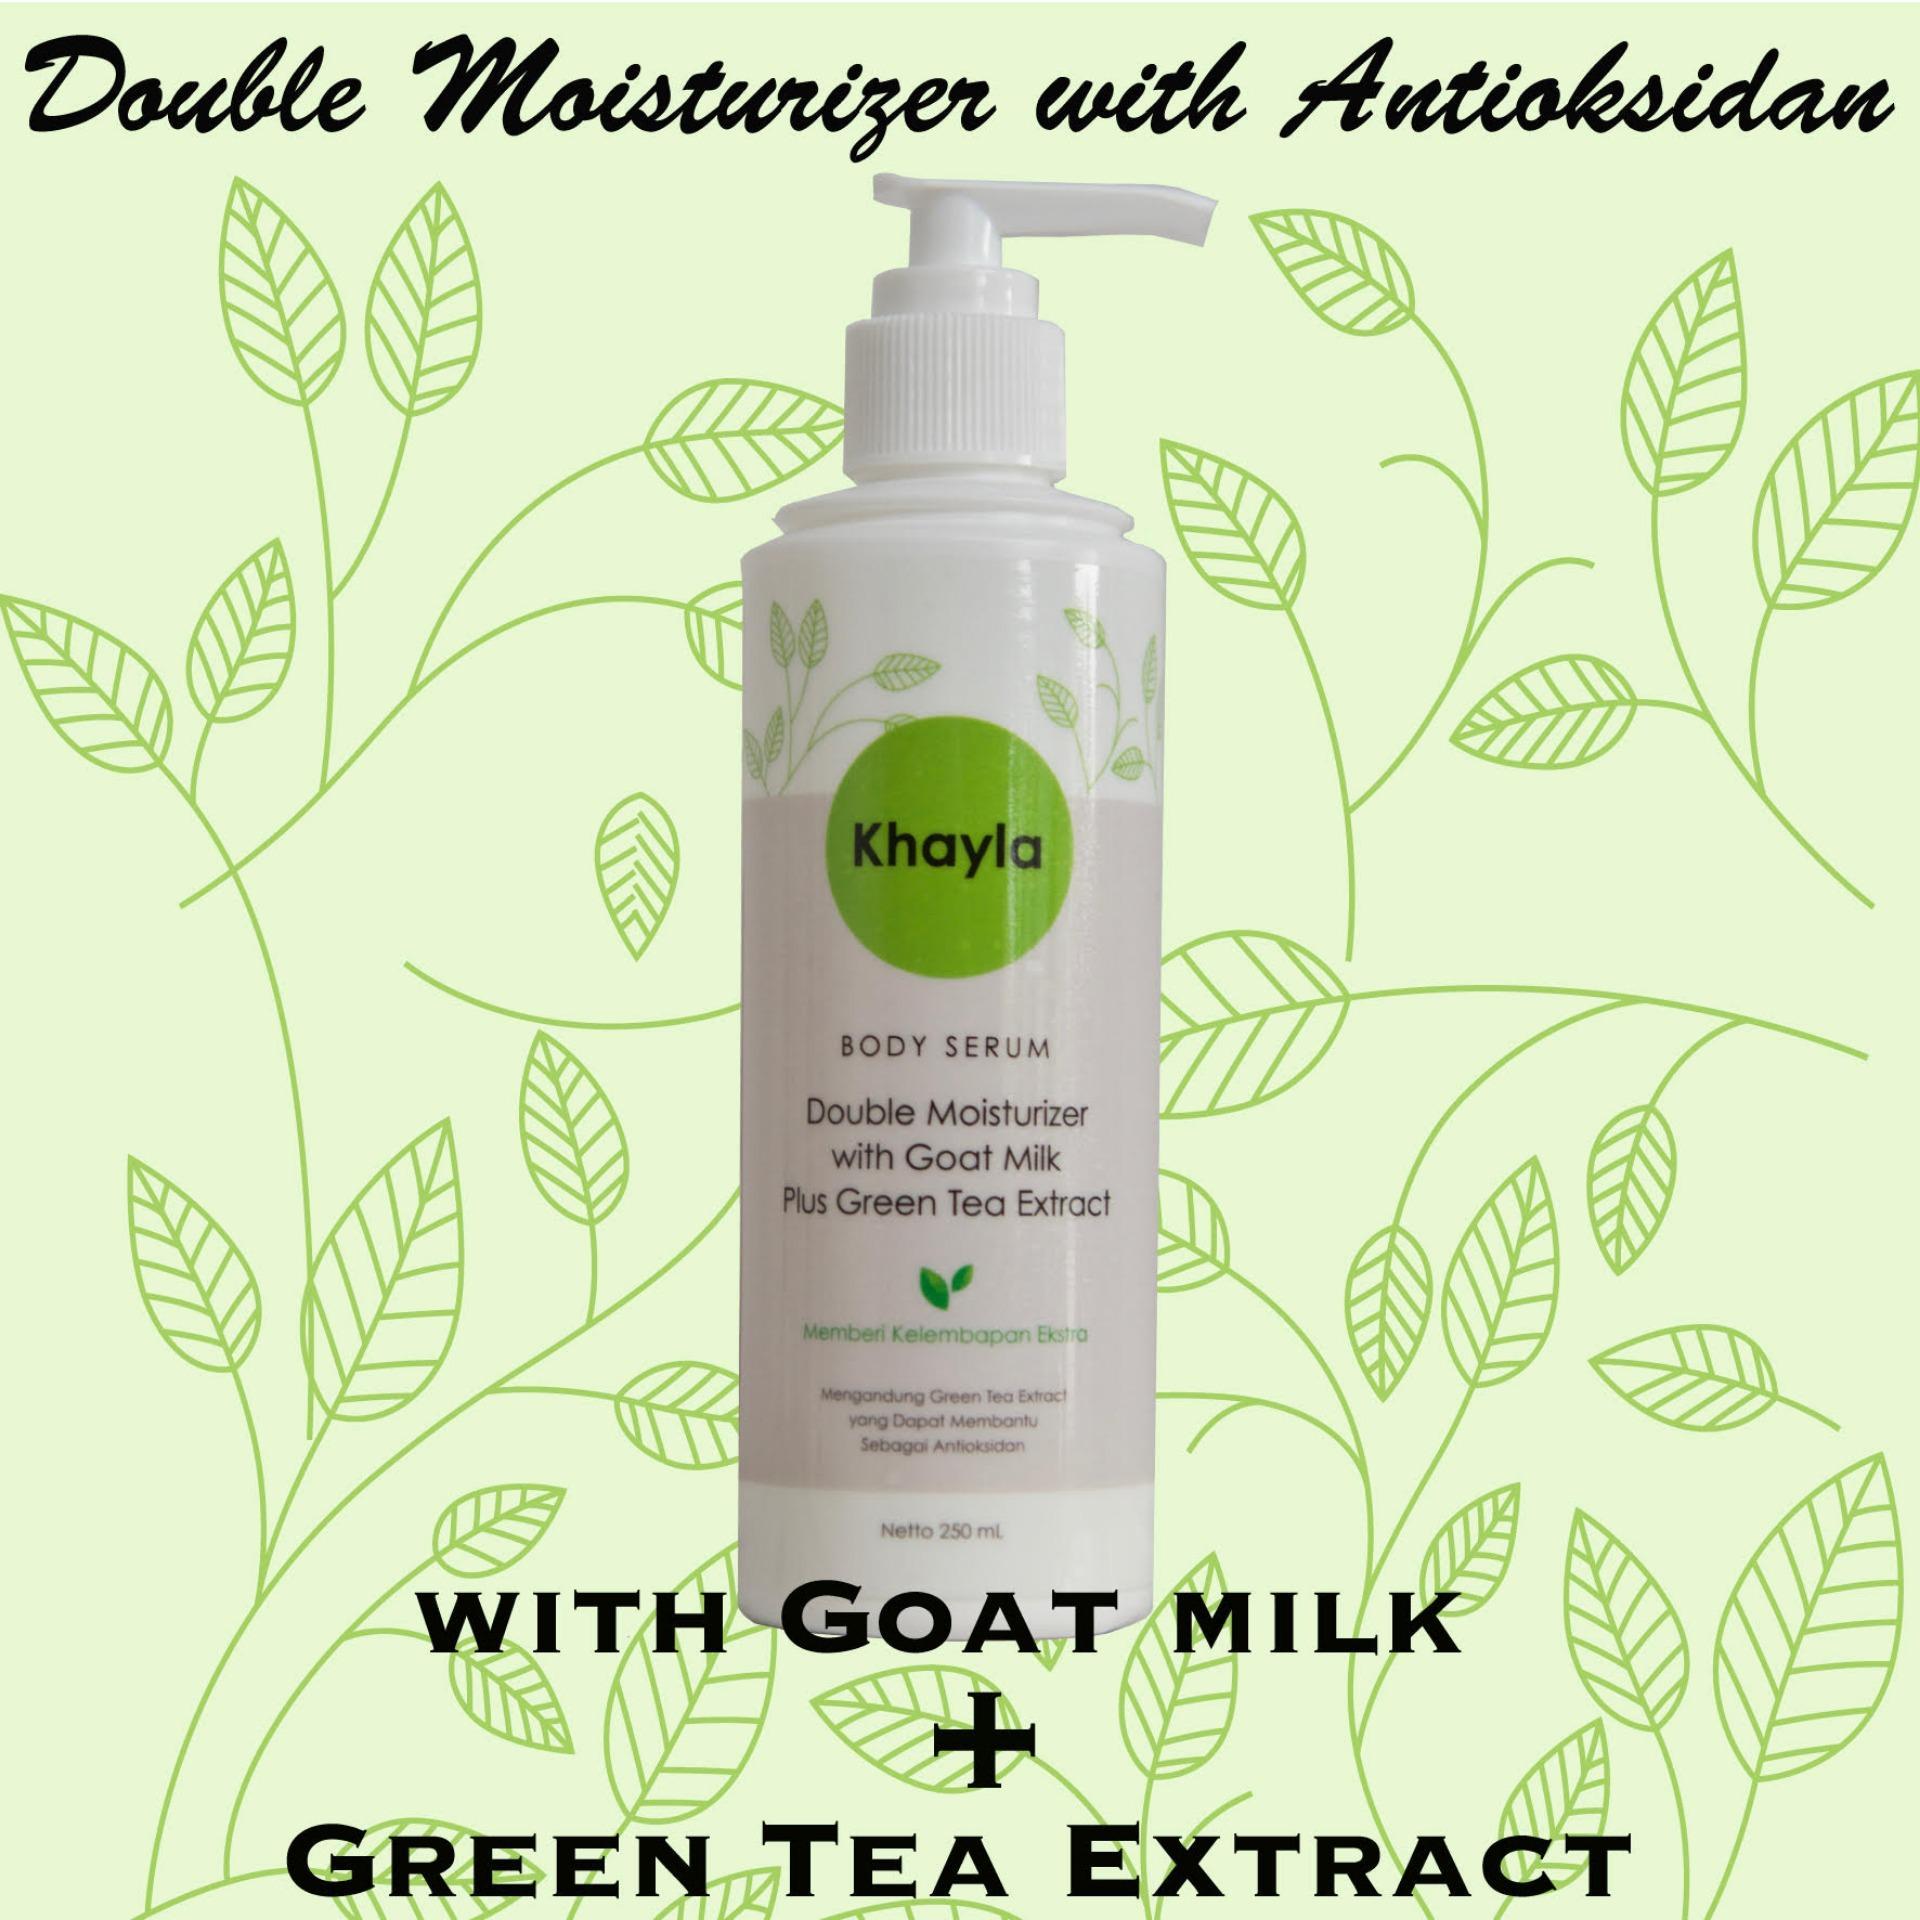 White Garden Shower Cream Goats Milk Pearl 250ml Daftar Harga Velvy Green Tea And Aloe Vera Flash Sale Khayla Double Moisturizer With Goat Plus Extract